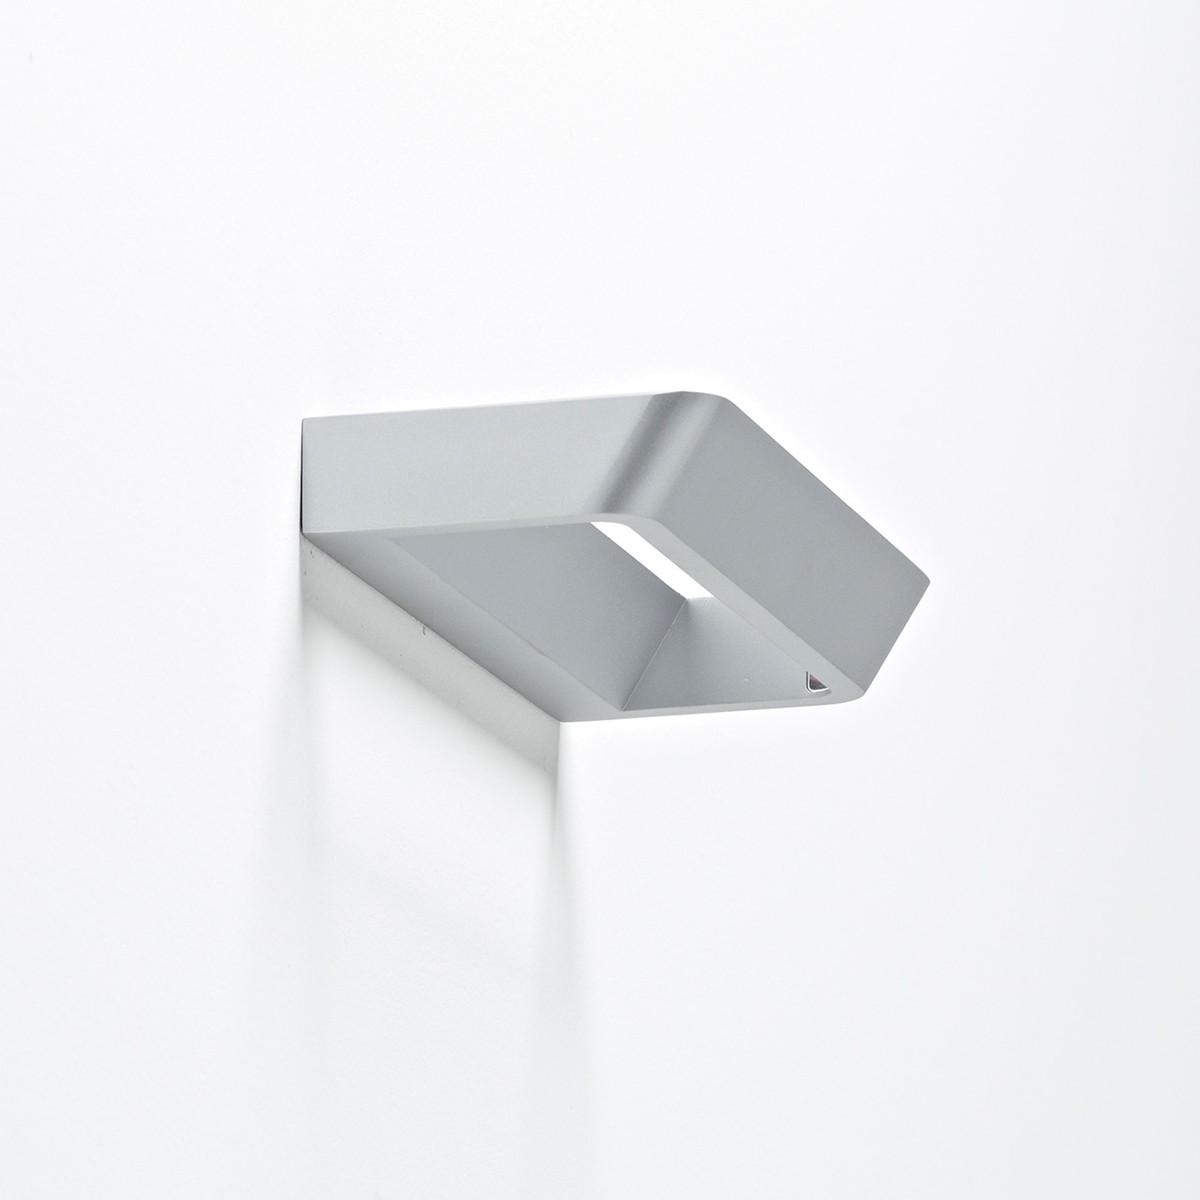 Rotaliana Belvedere W1 LED Wandleuchte, silber, 2700° K